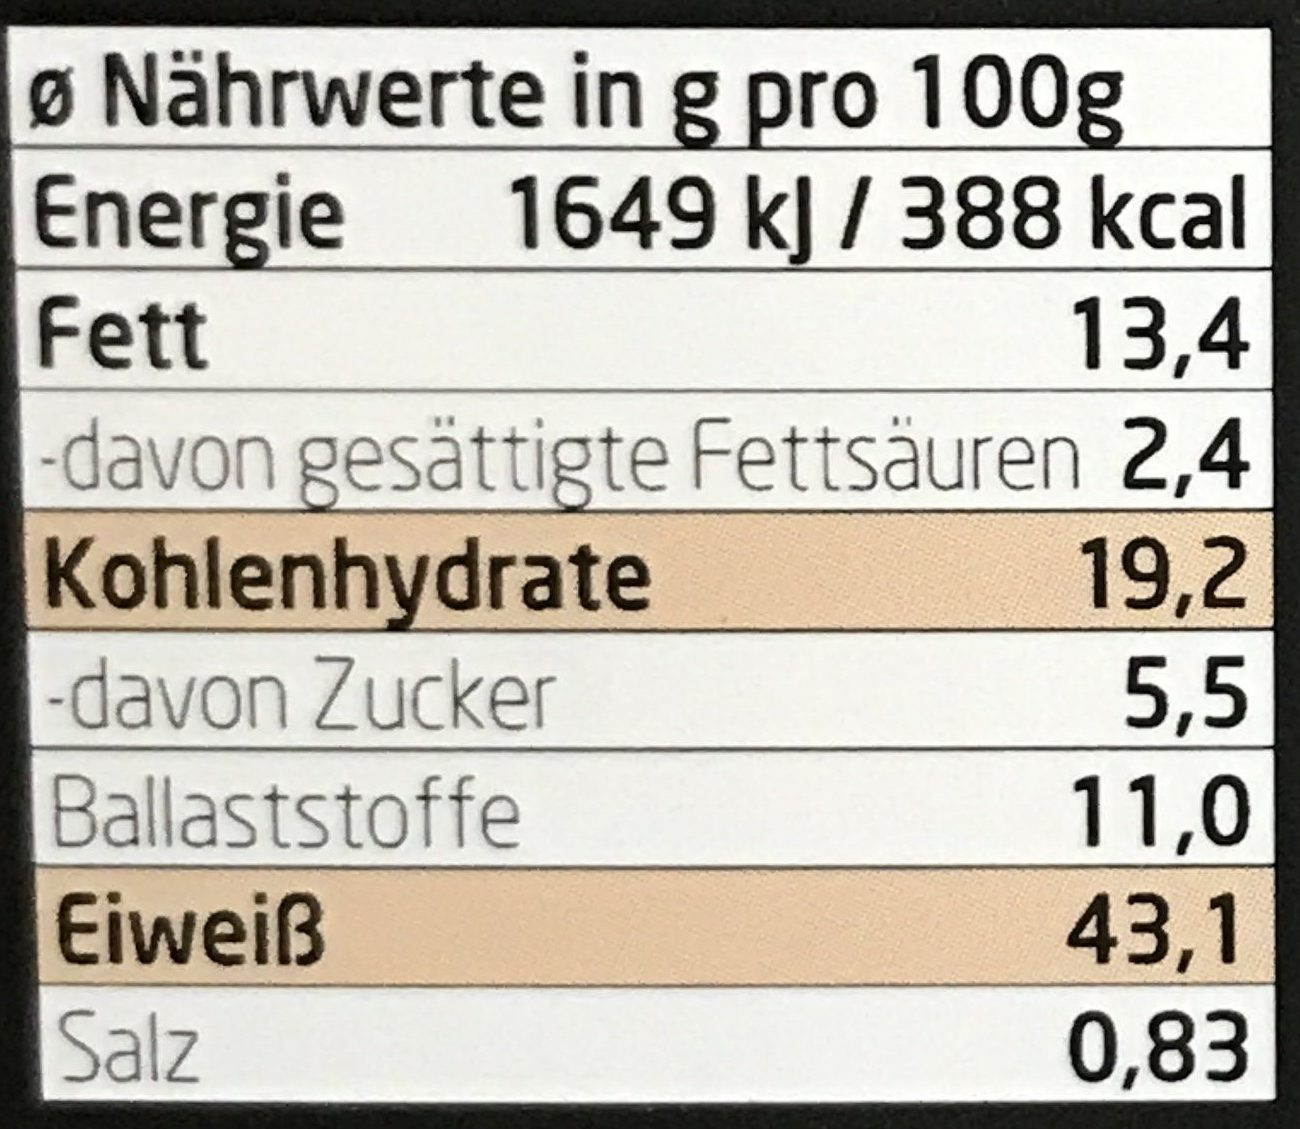 Protein müsli [choco-banane] - Nutrition facts - fr